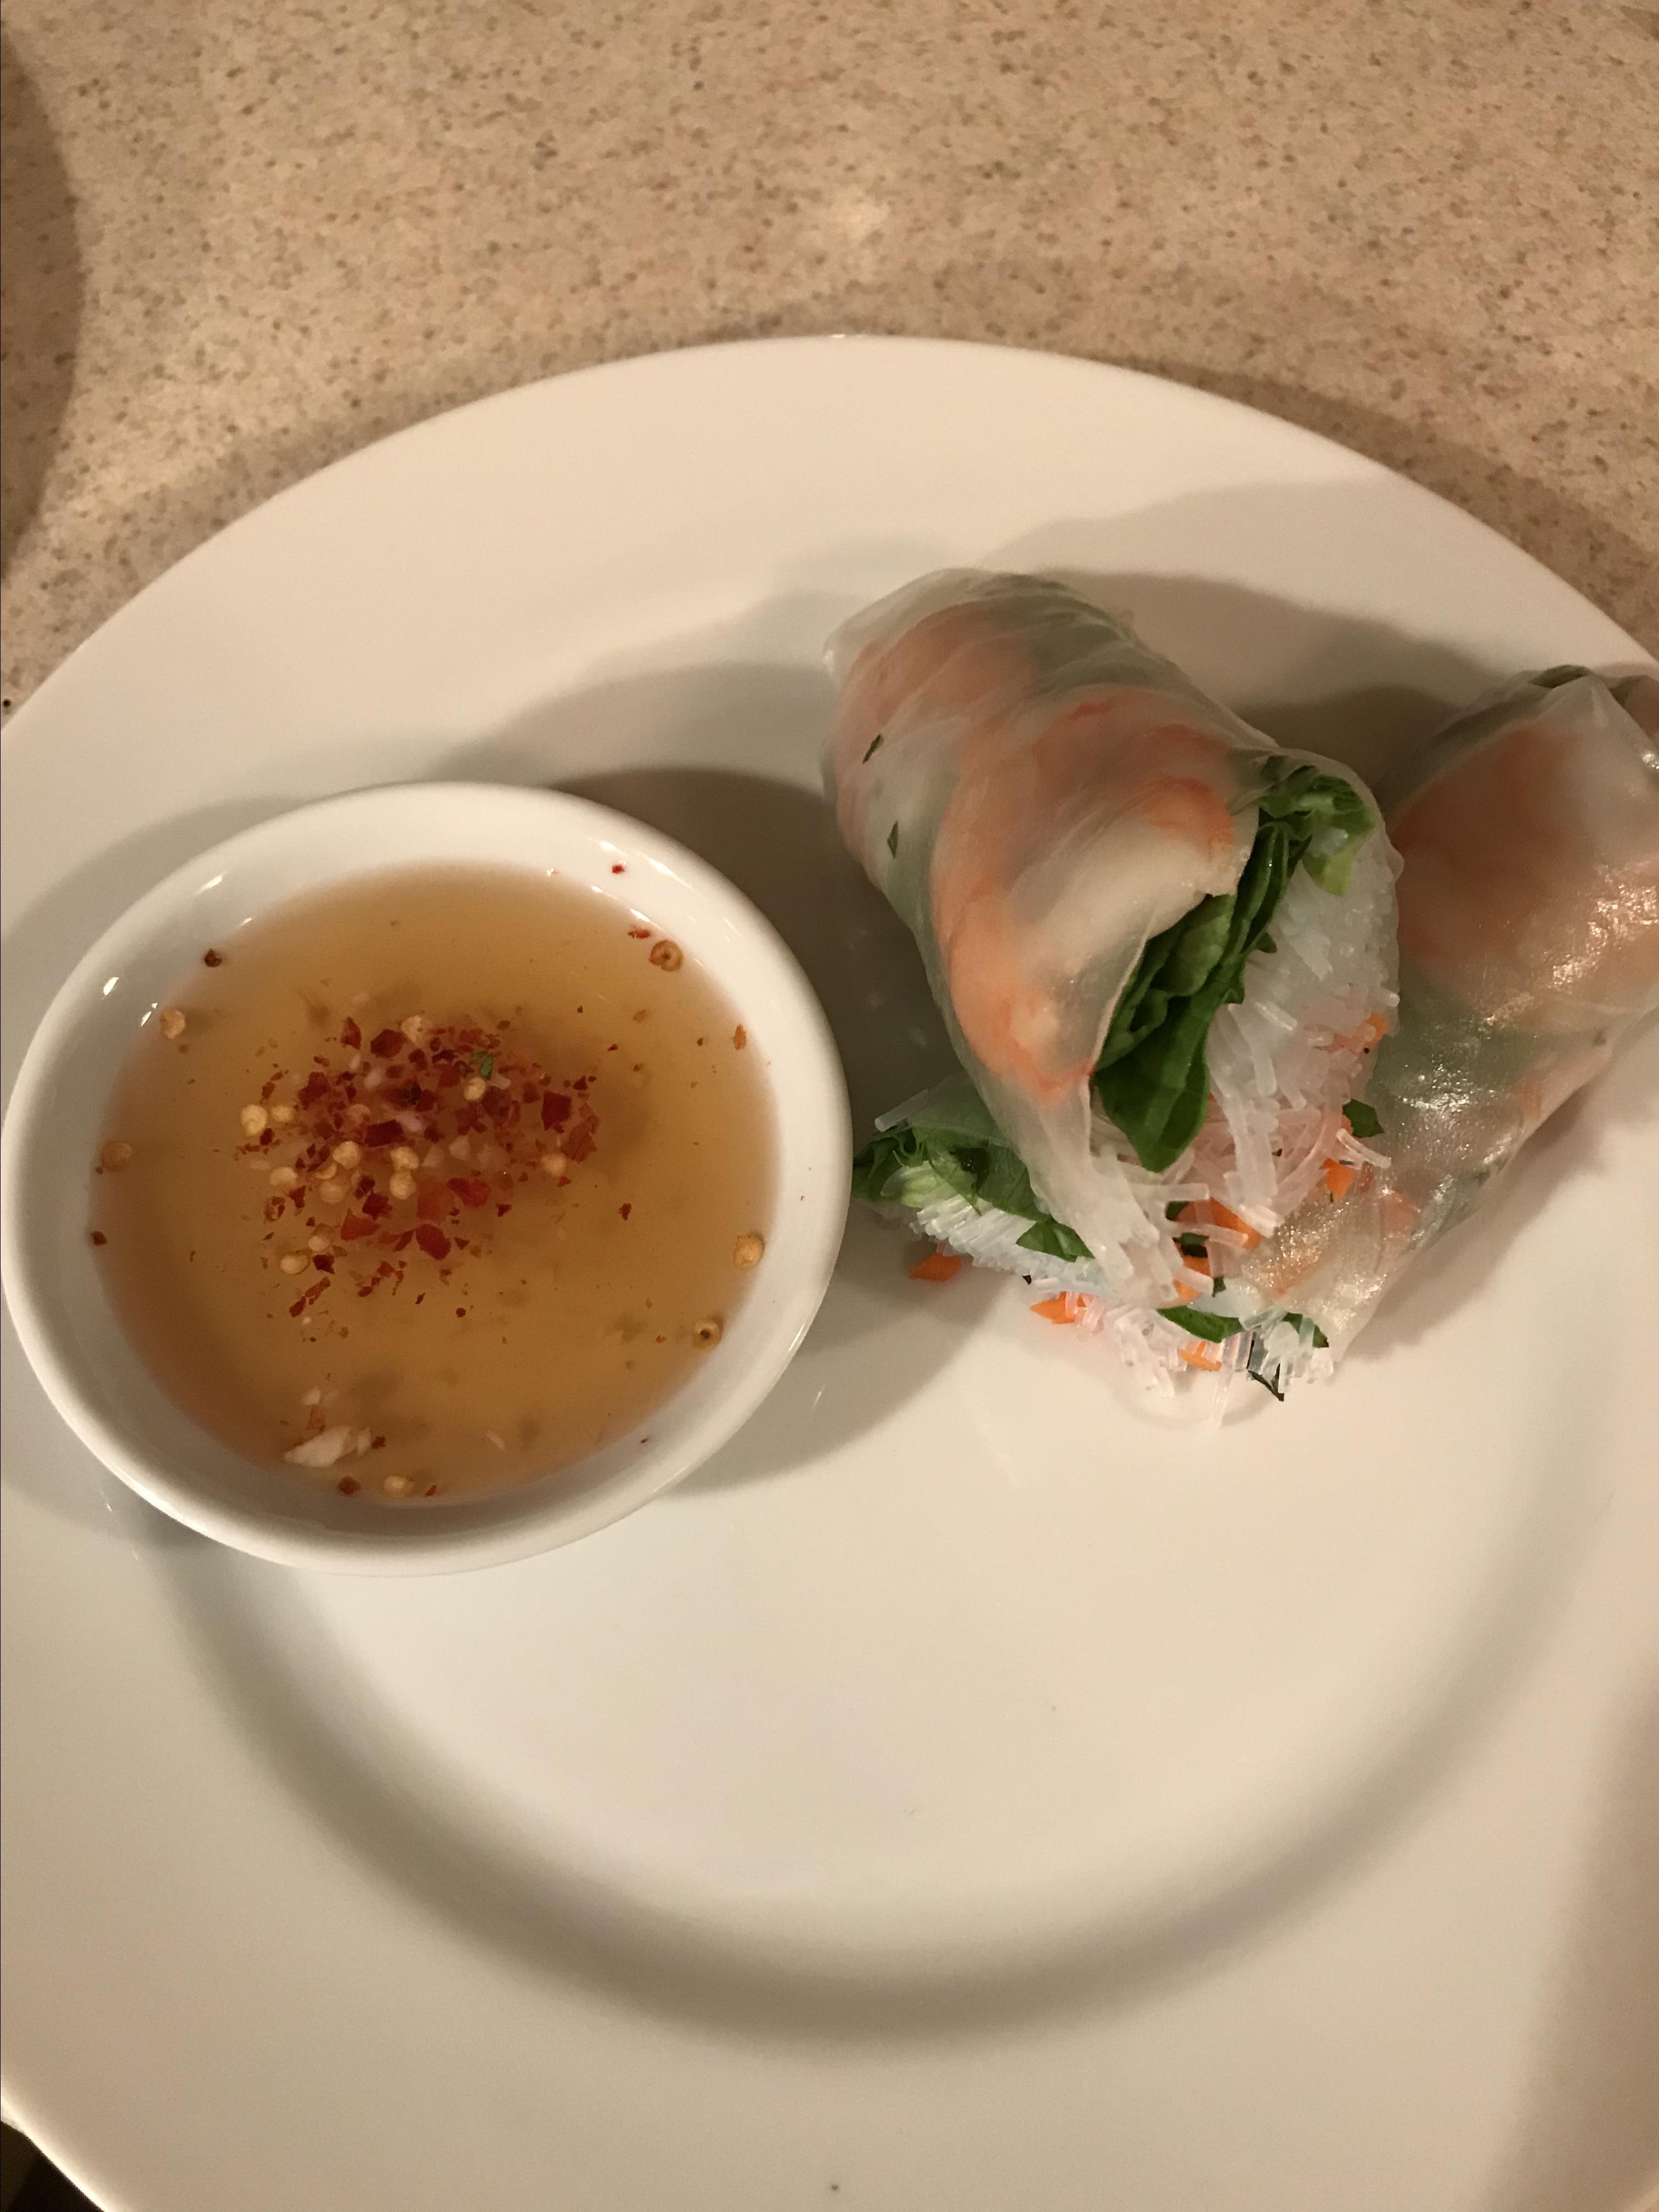 Nuoc Cham (Vietnamese Dipping Sauce) Laura Guerrero